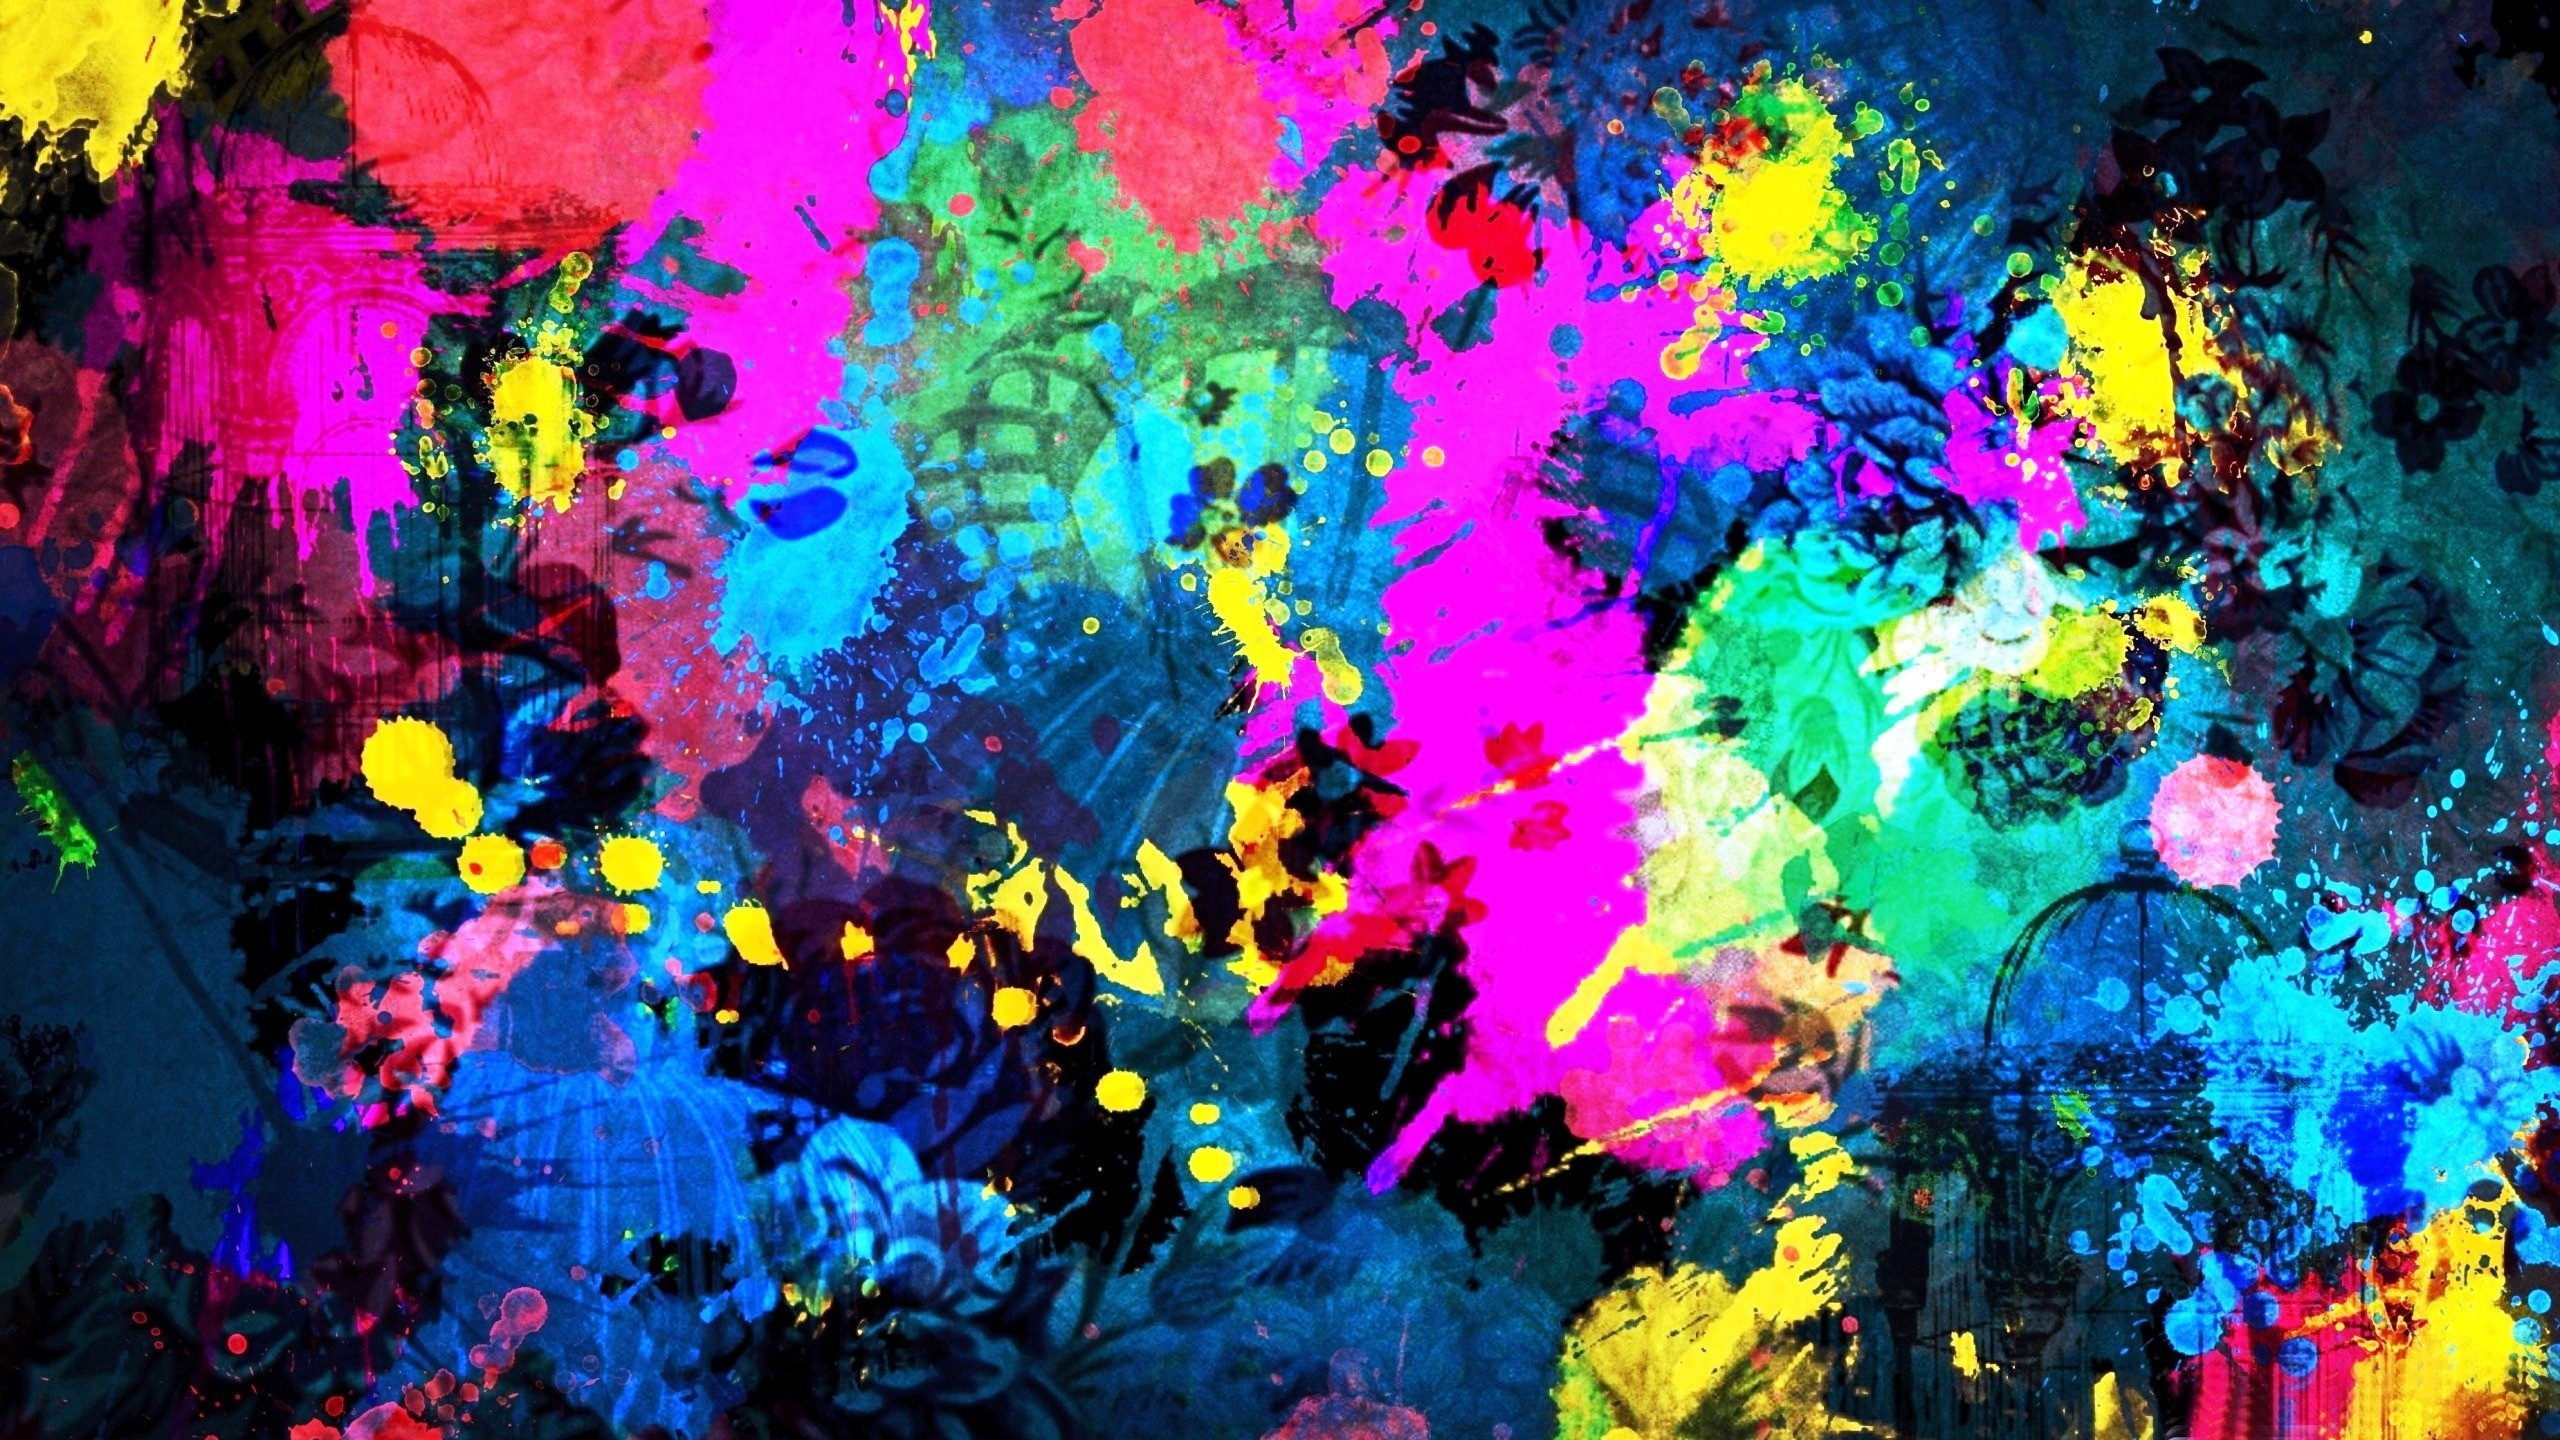 Abstract Art Wallpaper Hd 2853 Full HD Wallpaper Desktop – Res .